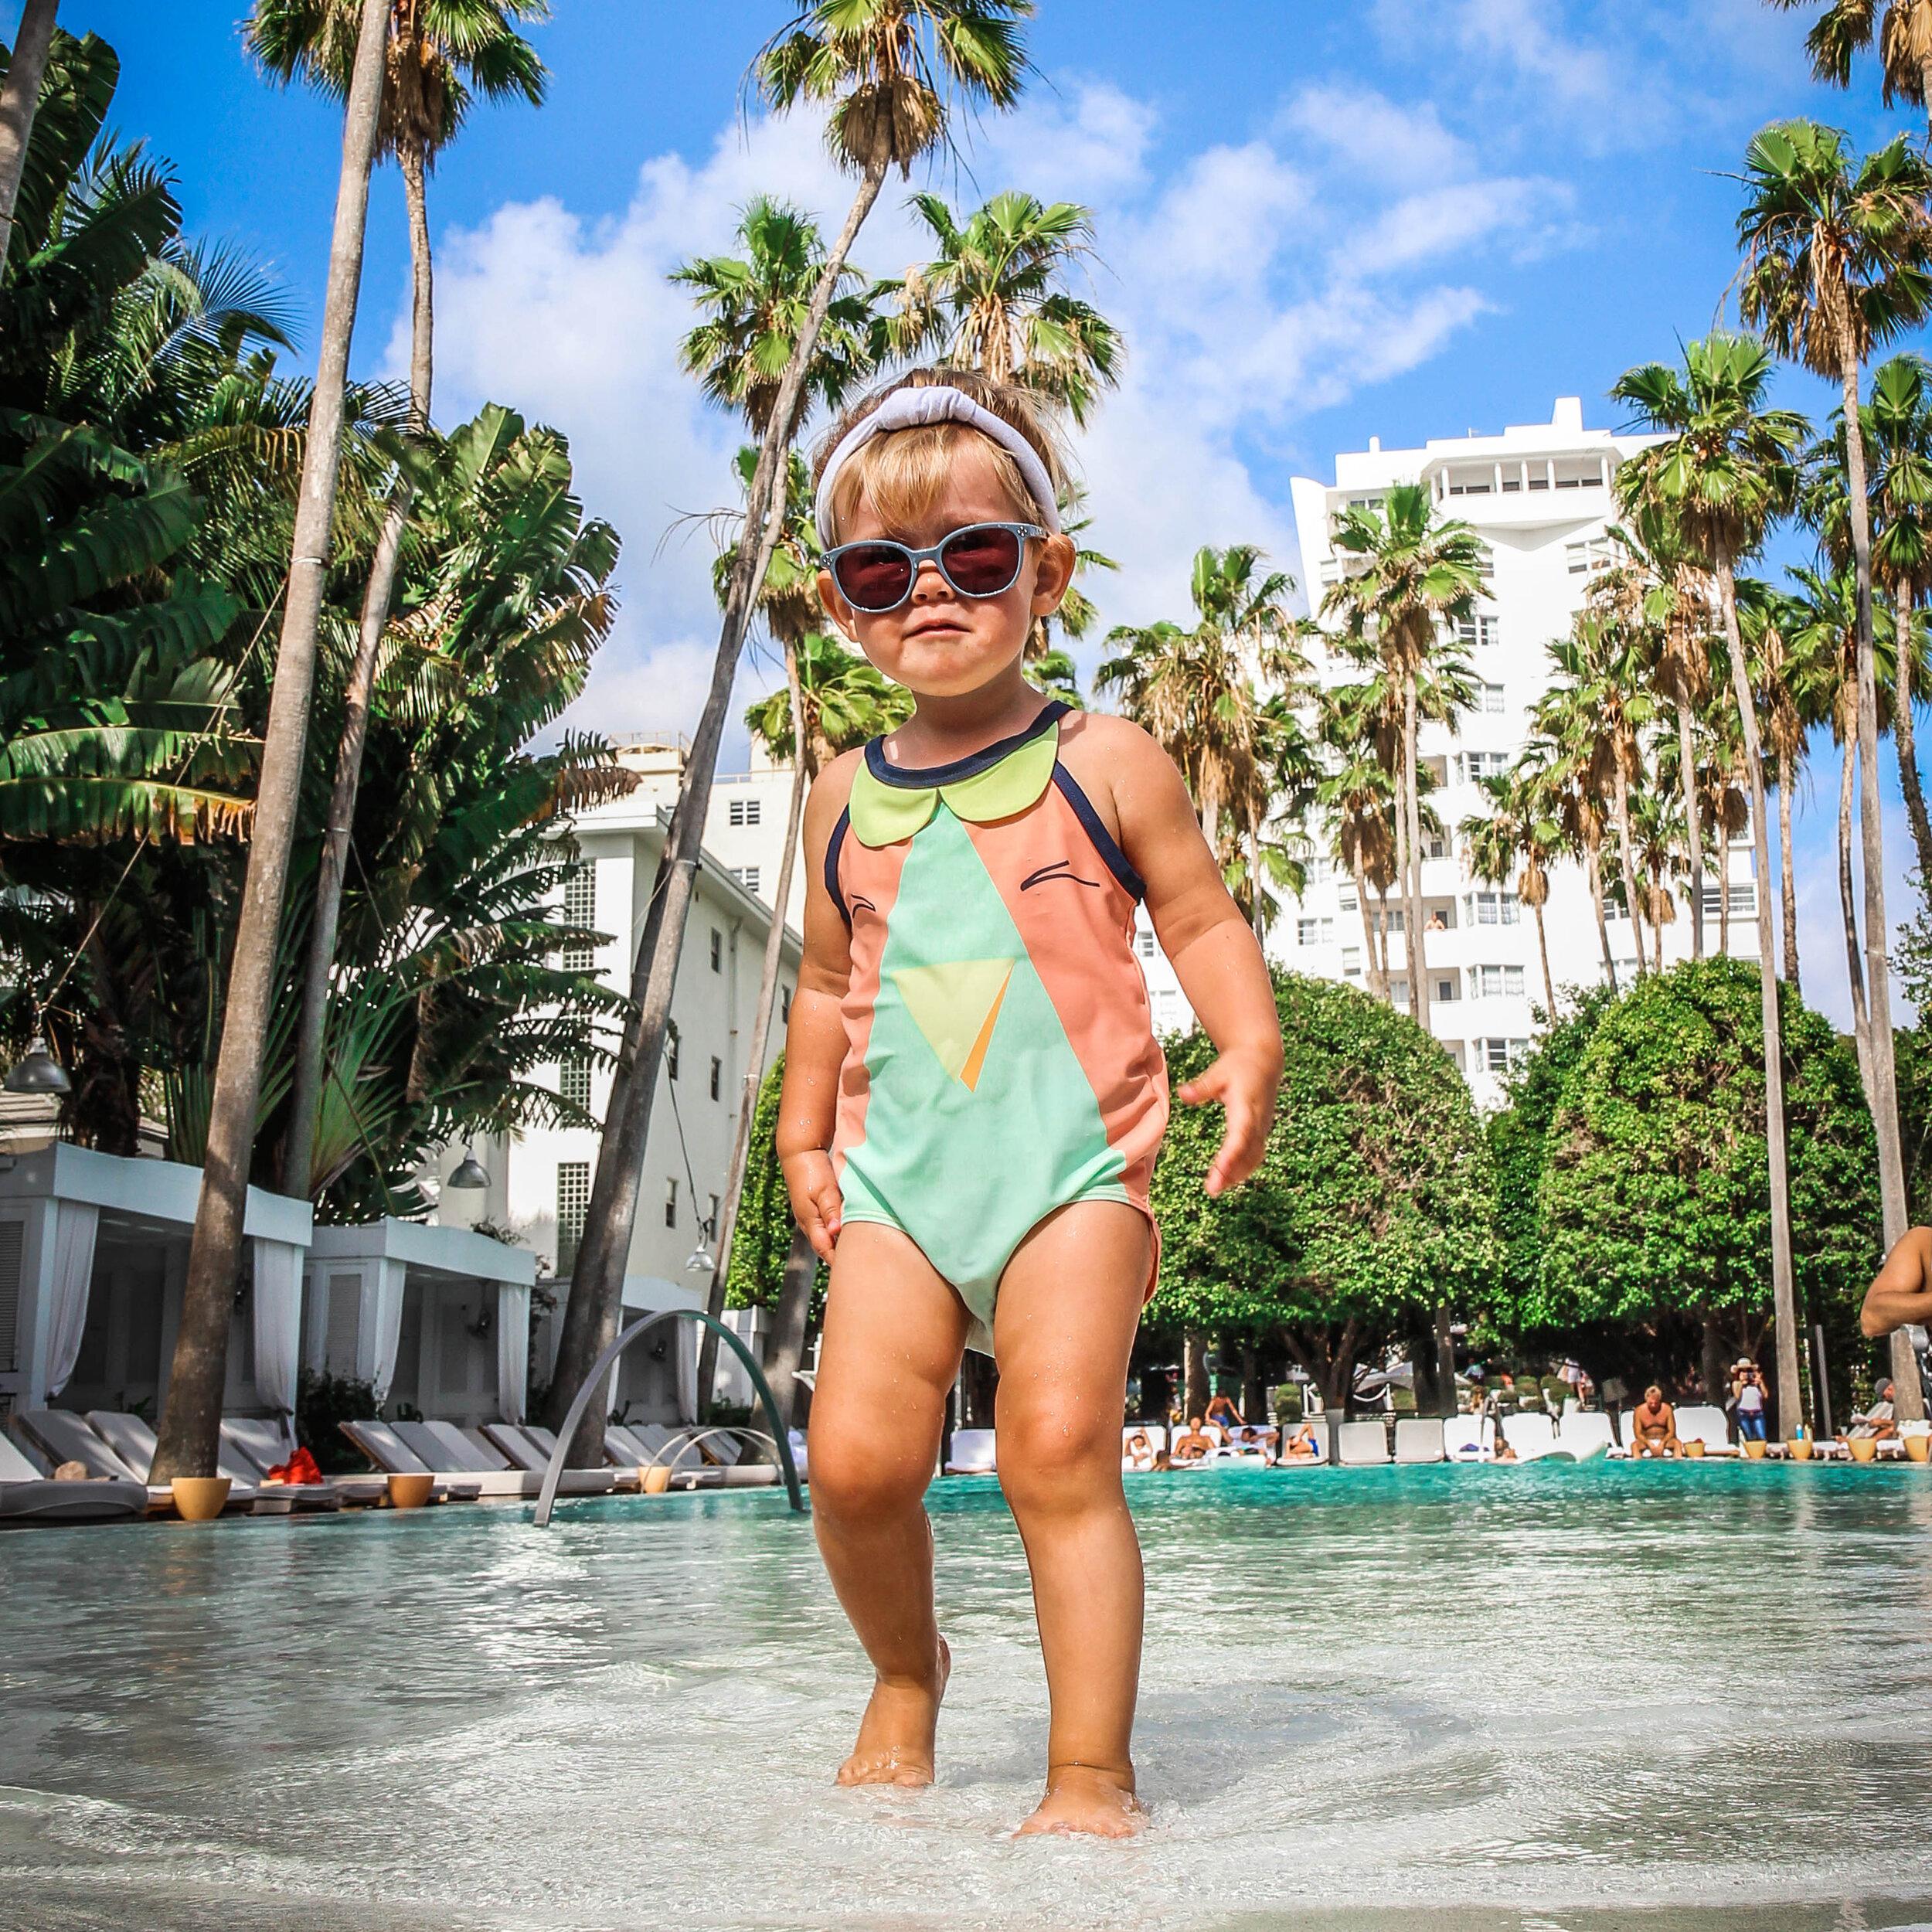 Delano_Miami_south_beach_reizen_met_kinderen-4.jpg